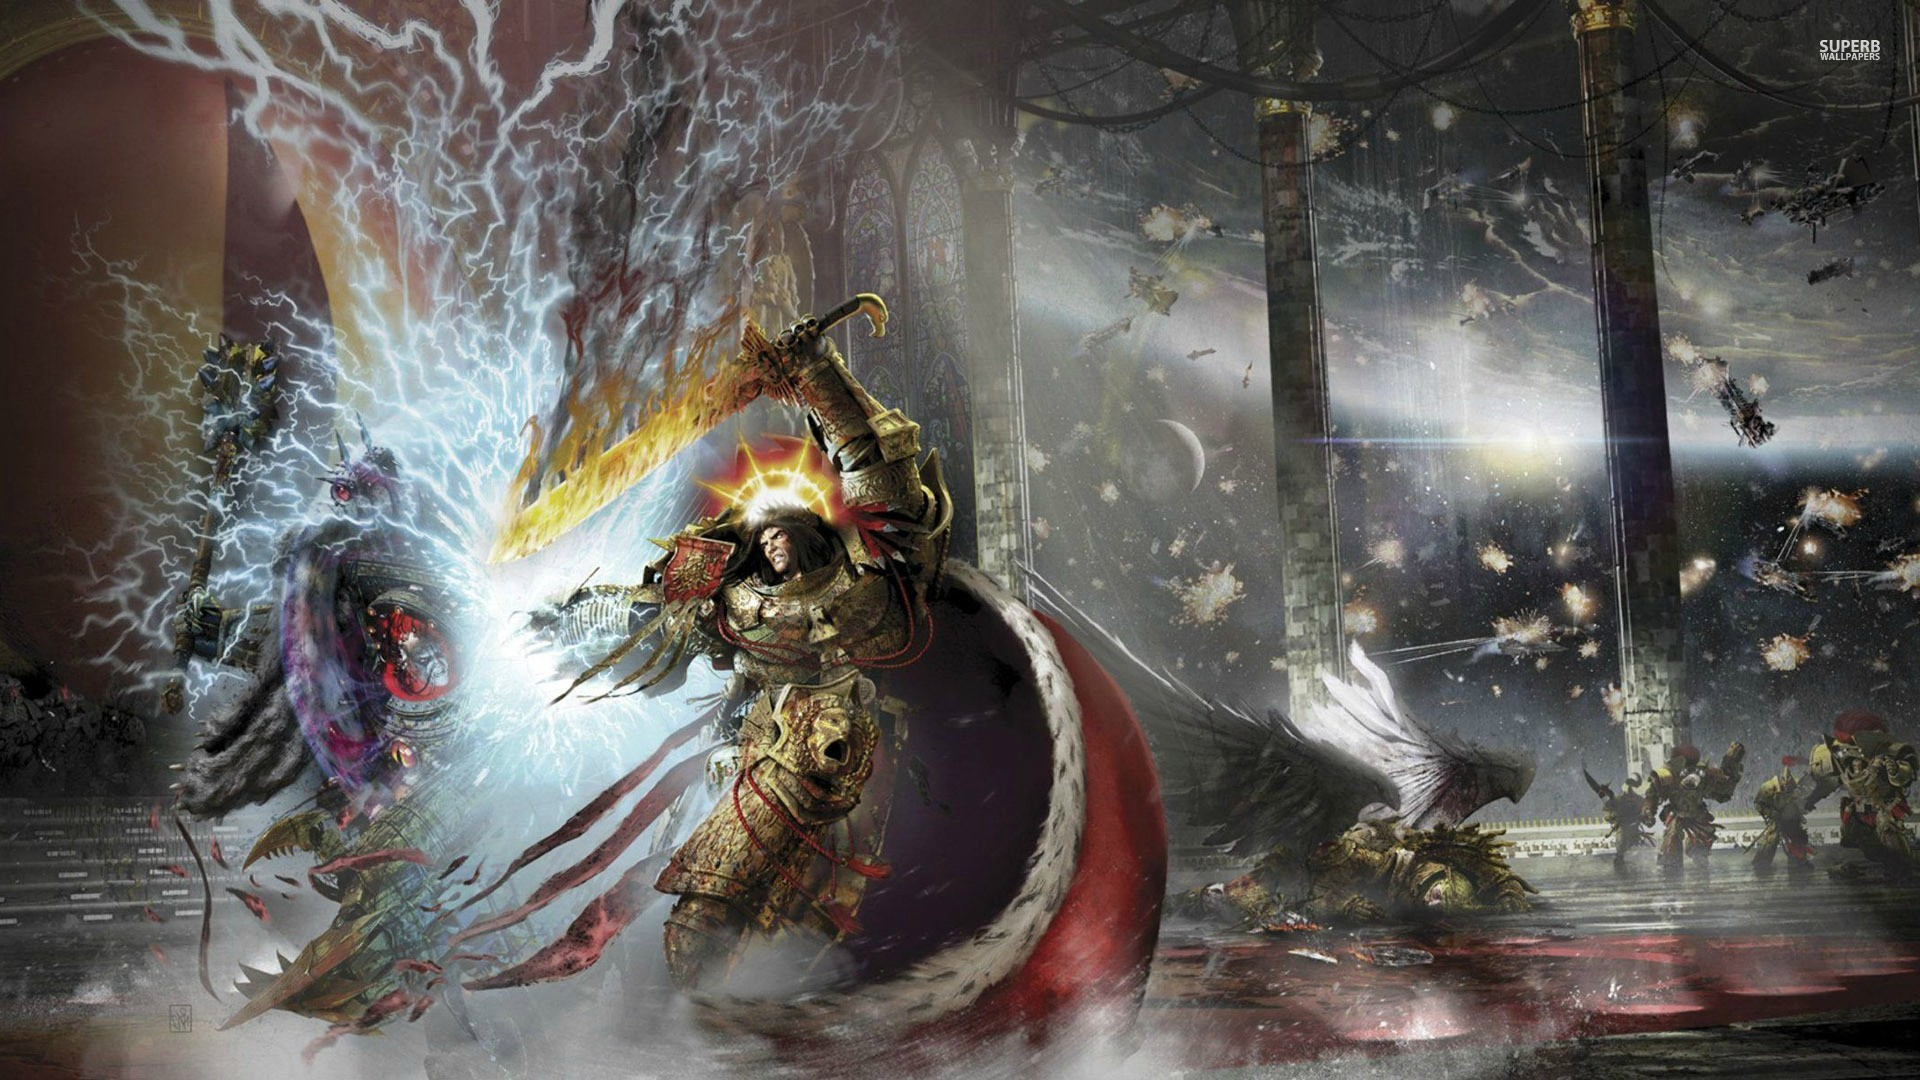 Horus Heresy Warhammer 40k Hd Wallpaper Warhammer 40k